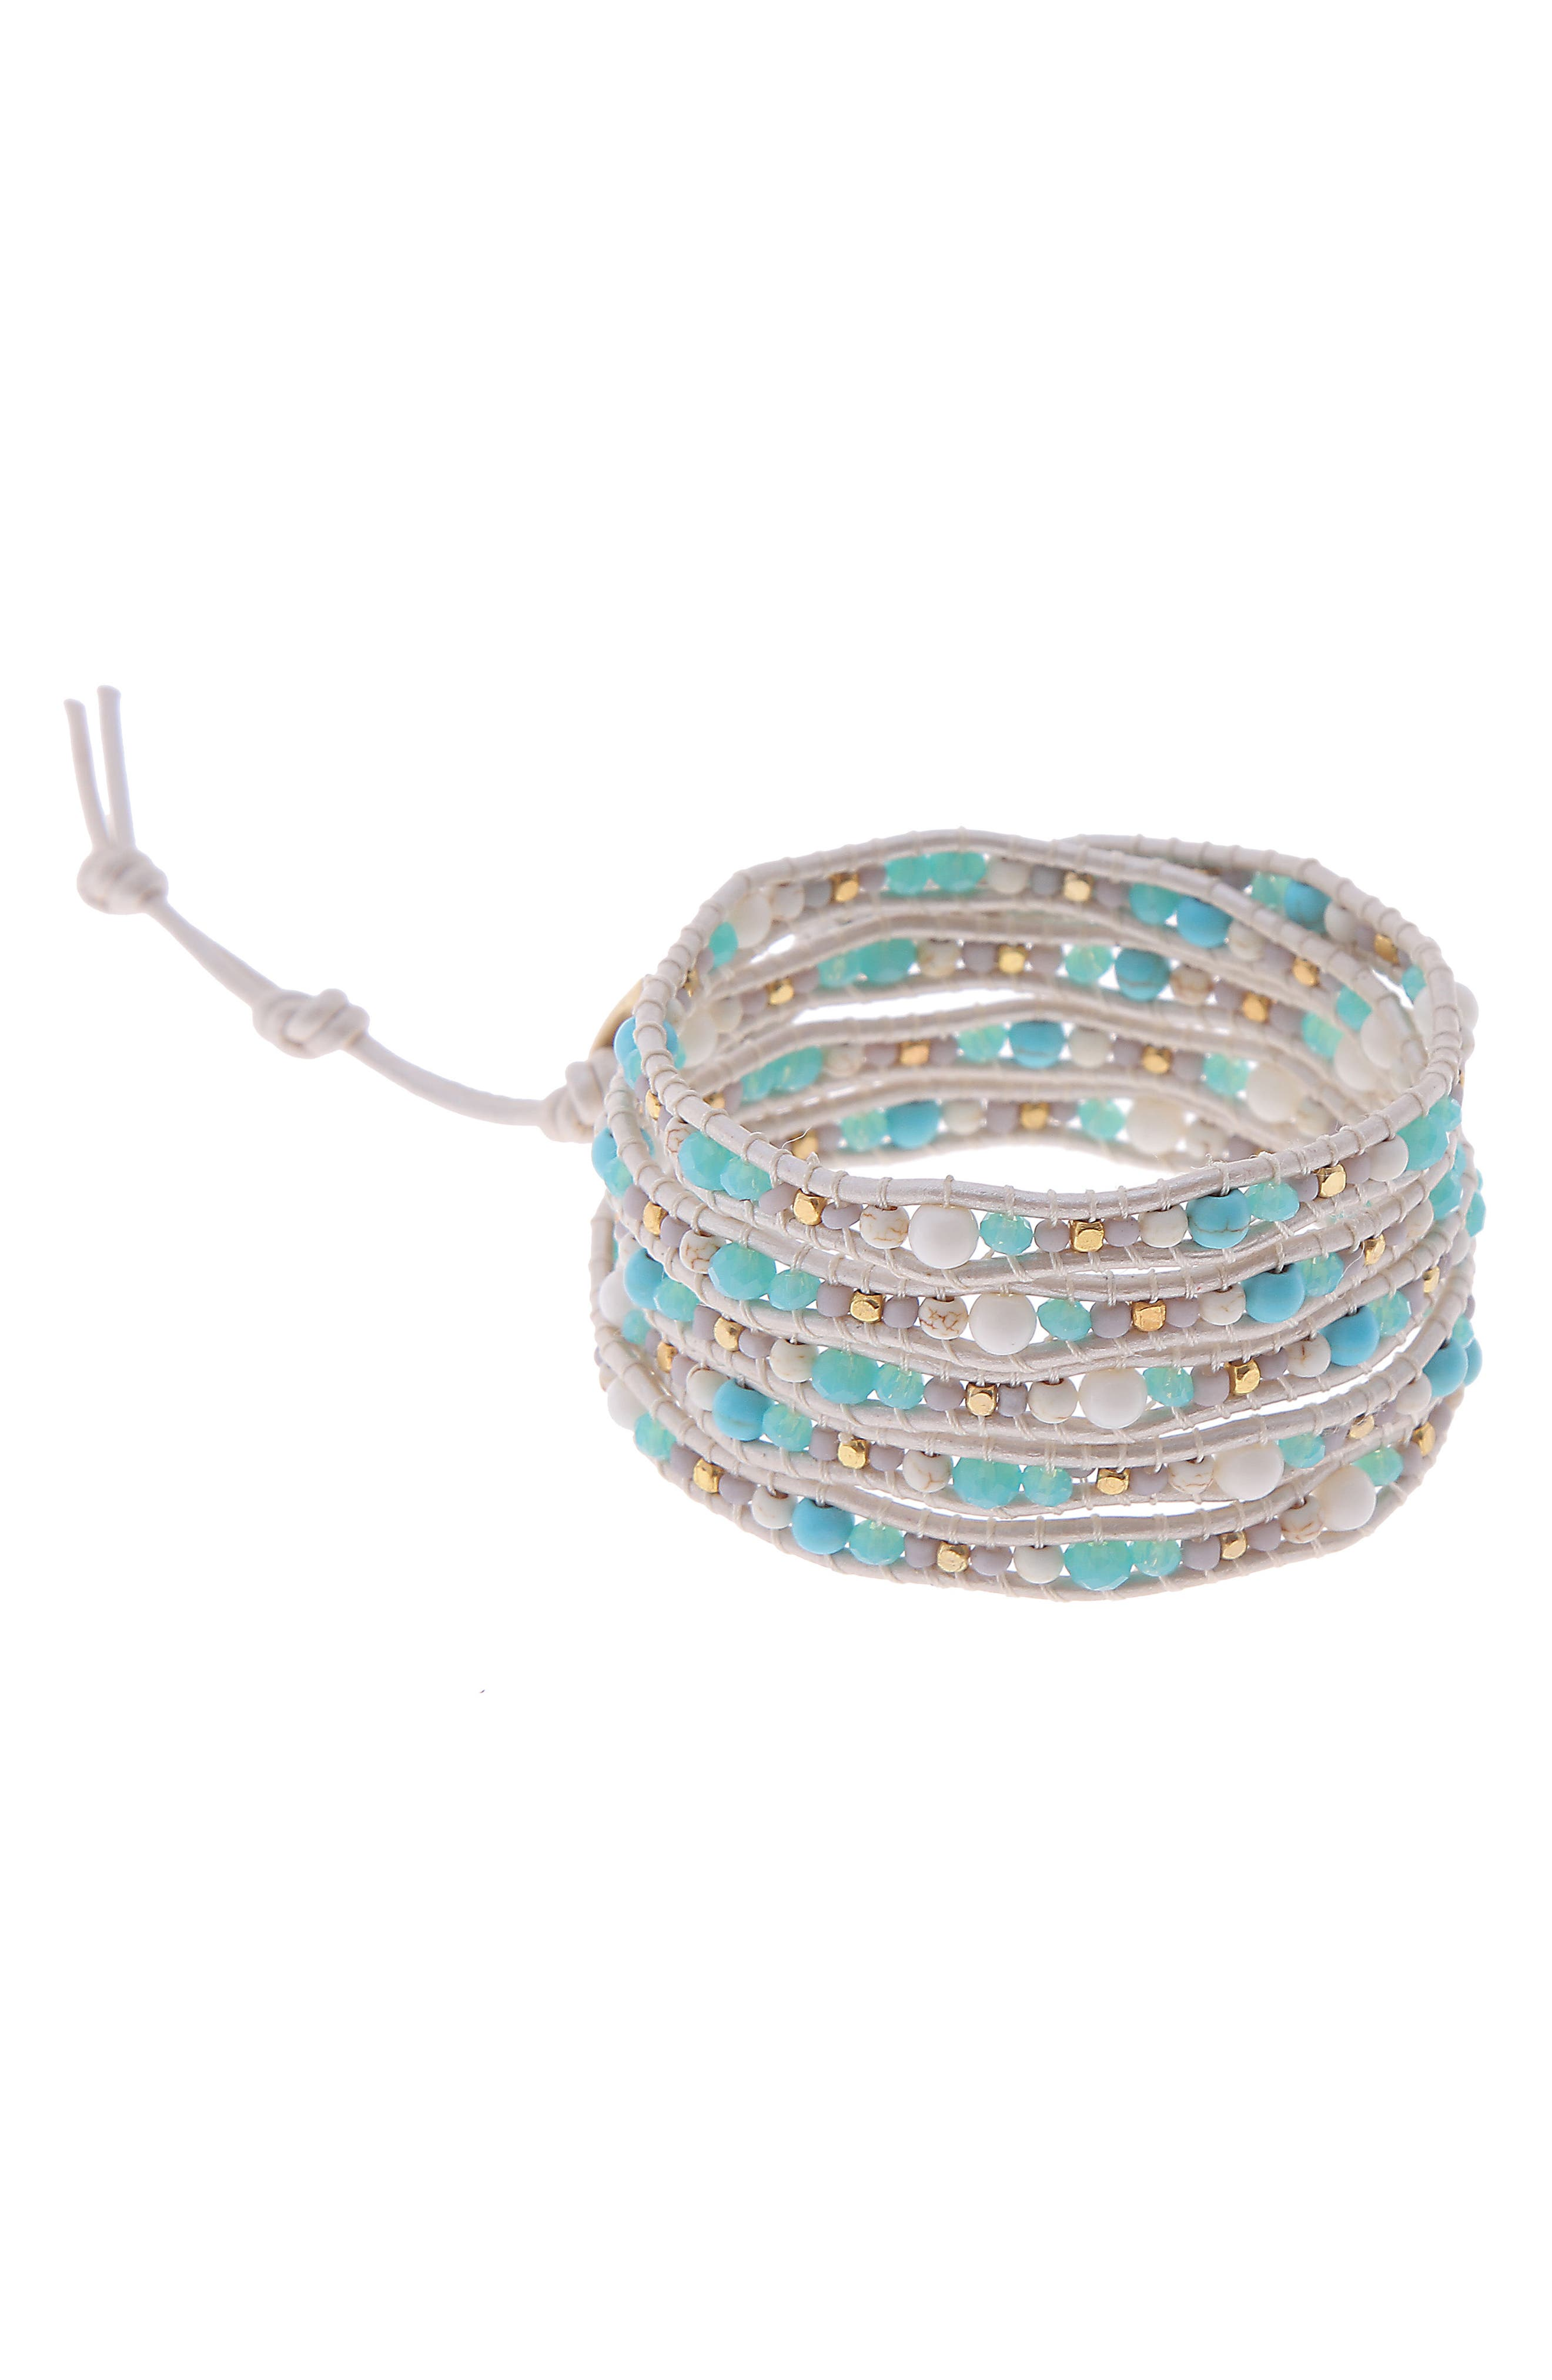 Stone & Metal Wrap Bracelet,                             Main thumbnail 1, color,                             Turquoise